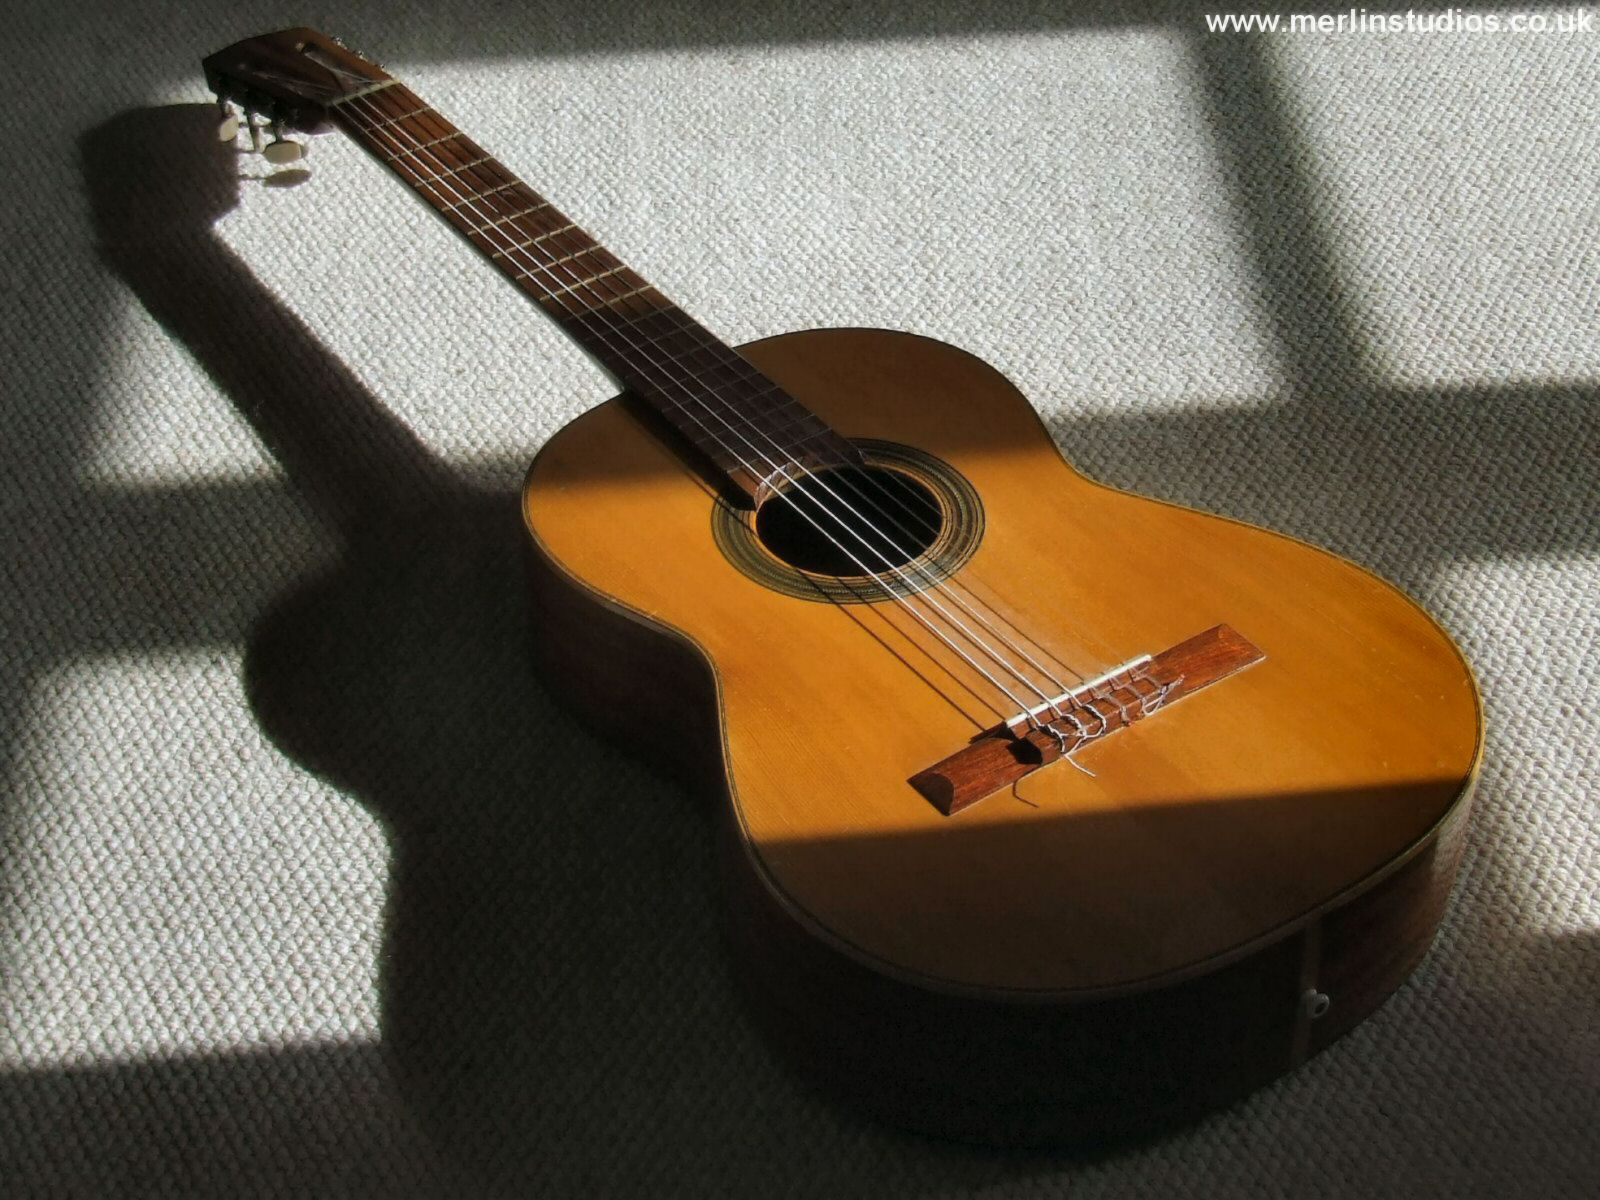 Ка��инки classic guitar wallpapers picpoolru